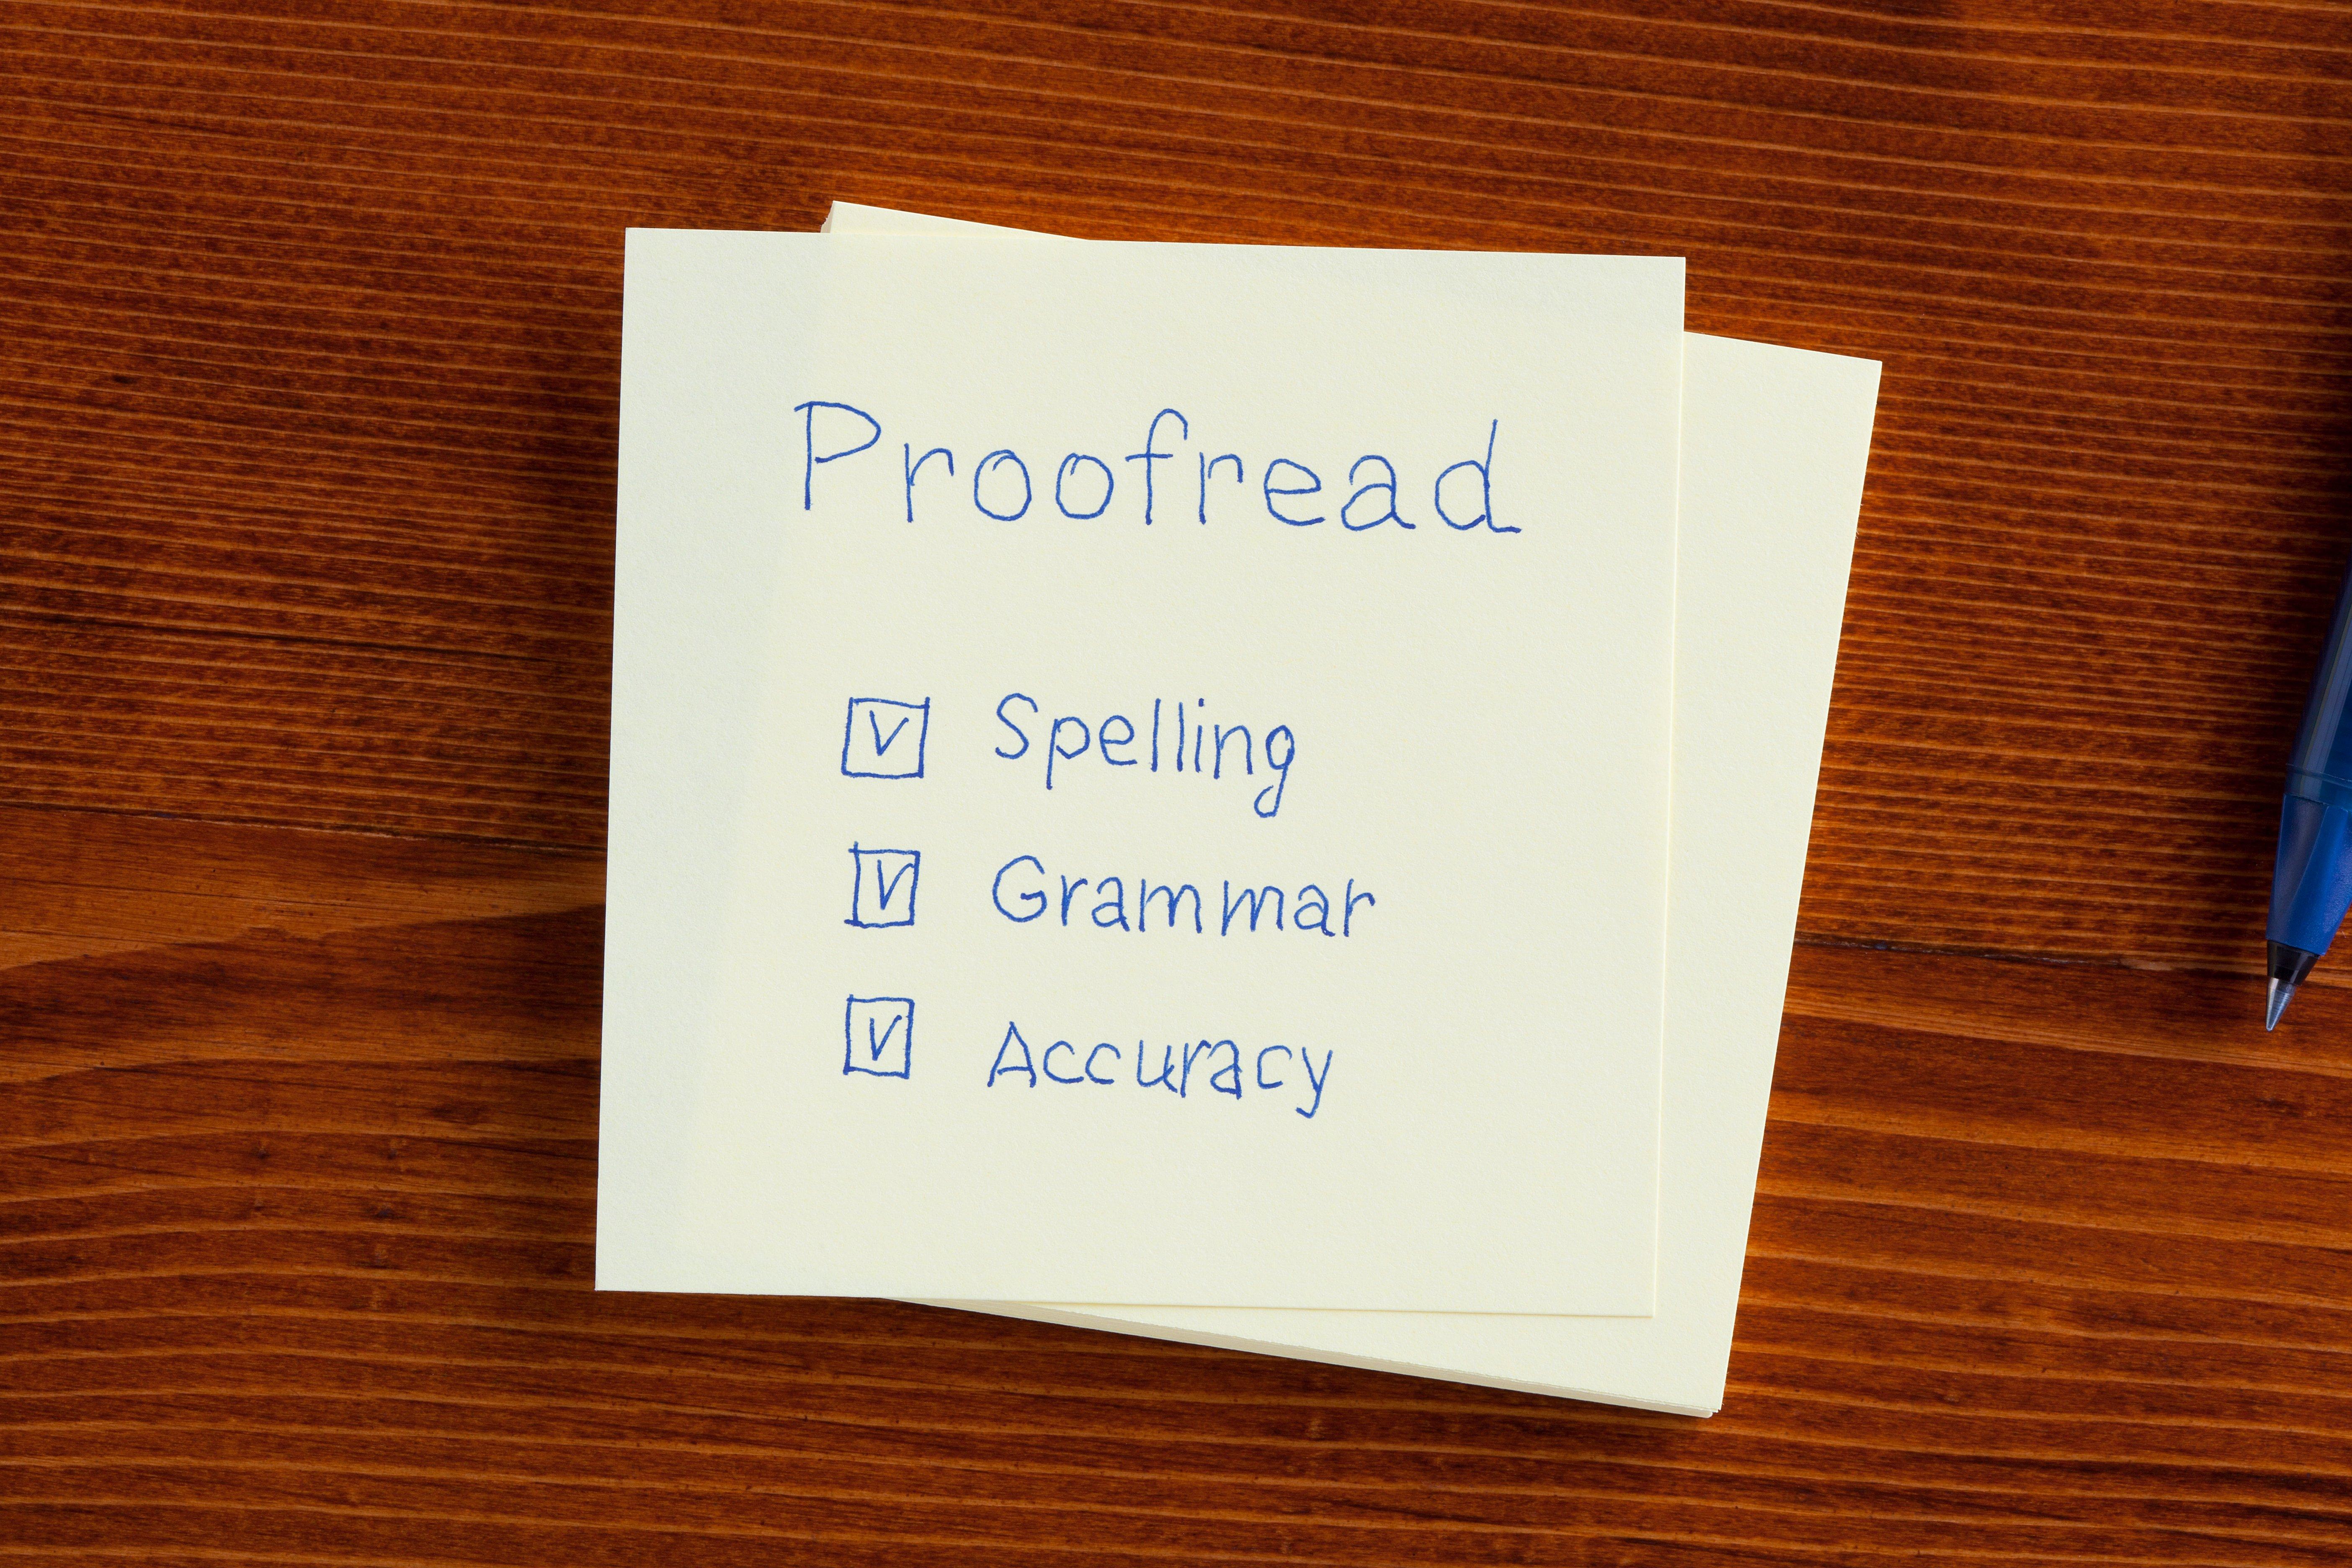 Proofread spelling grammar accuracy